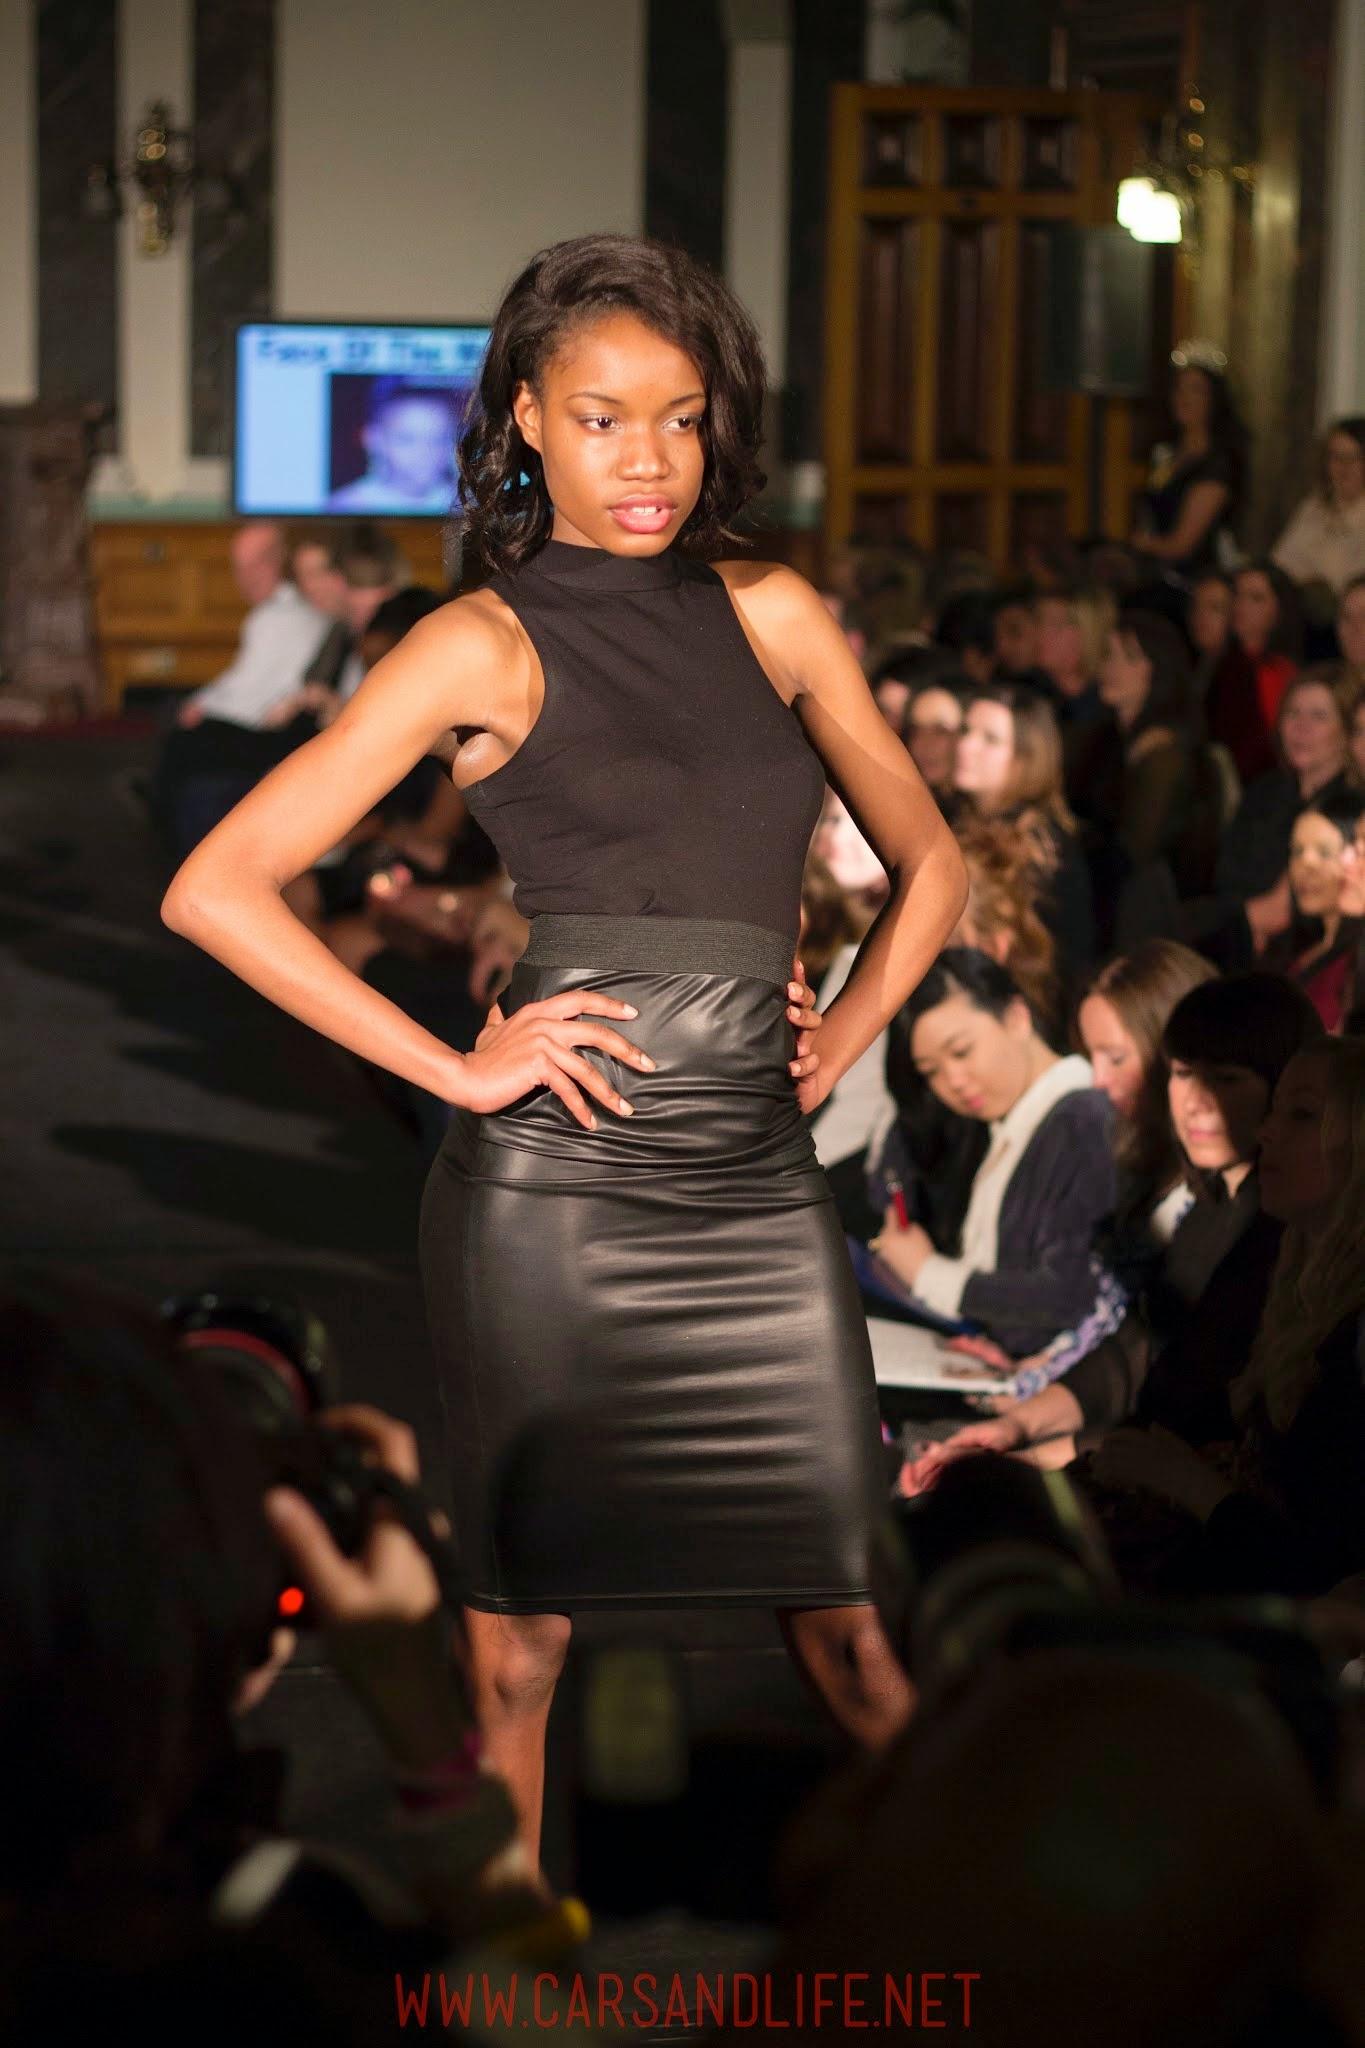 Birmingham International Fashion Week 2014 Part 1